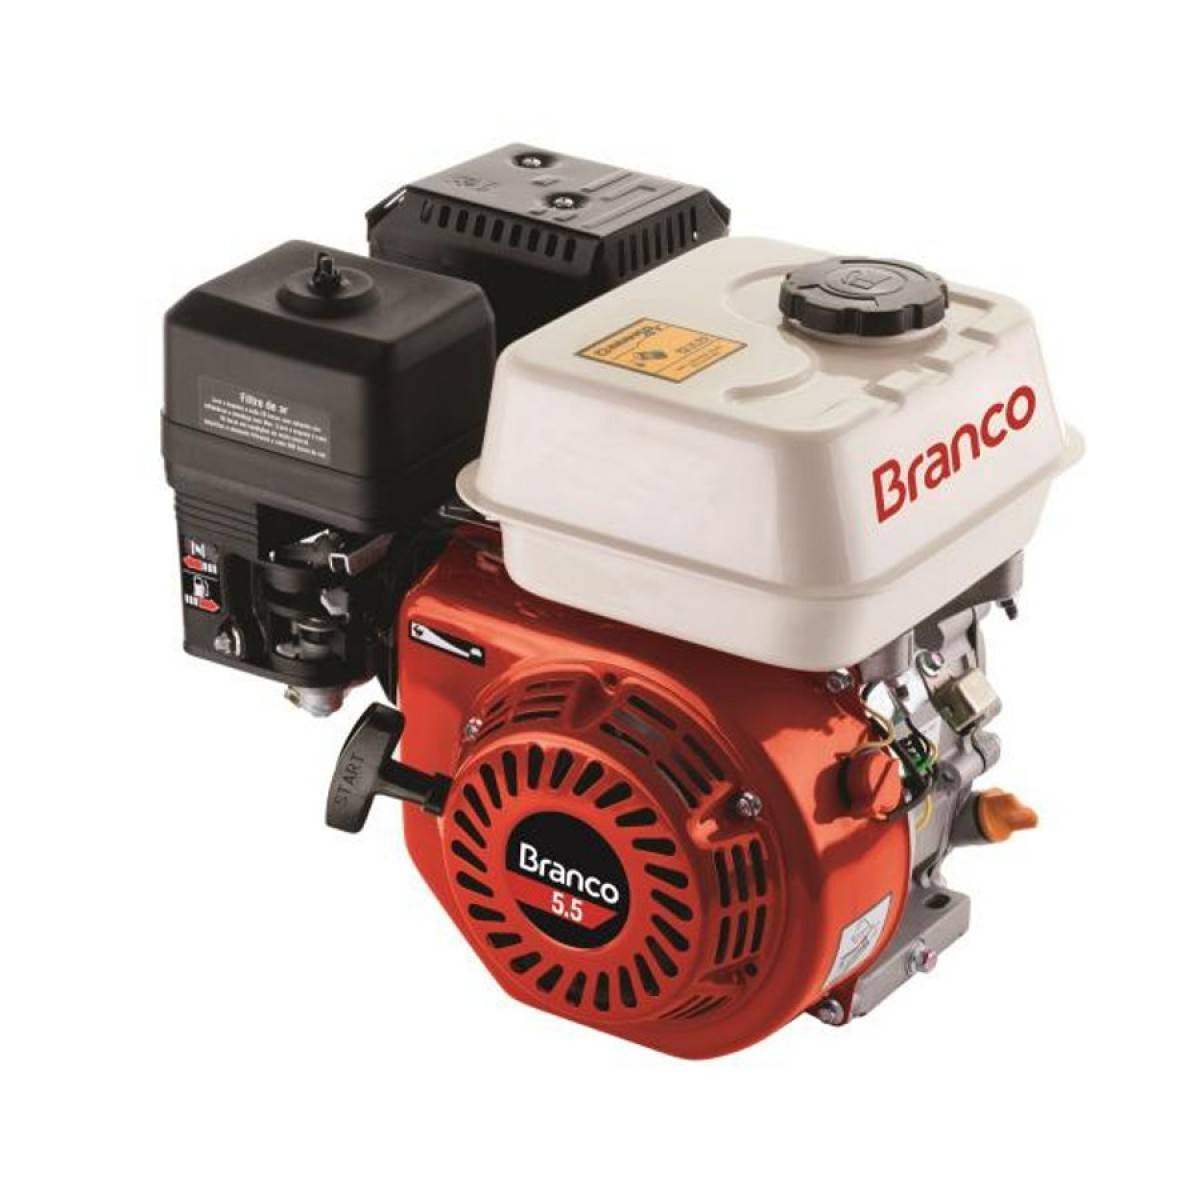 MOTOR B4T 6,5 Part. Manual Filtro ar a oleo, ADQUIRA AGORA! - BSS Maquinas